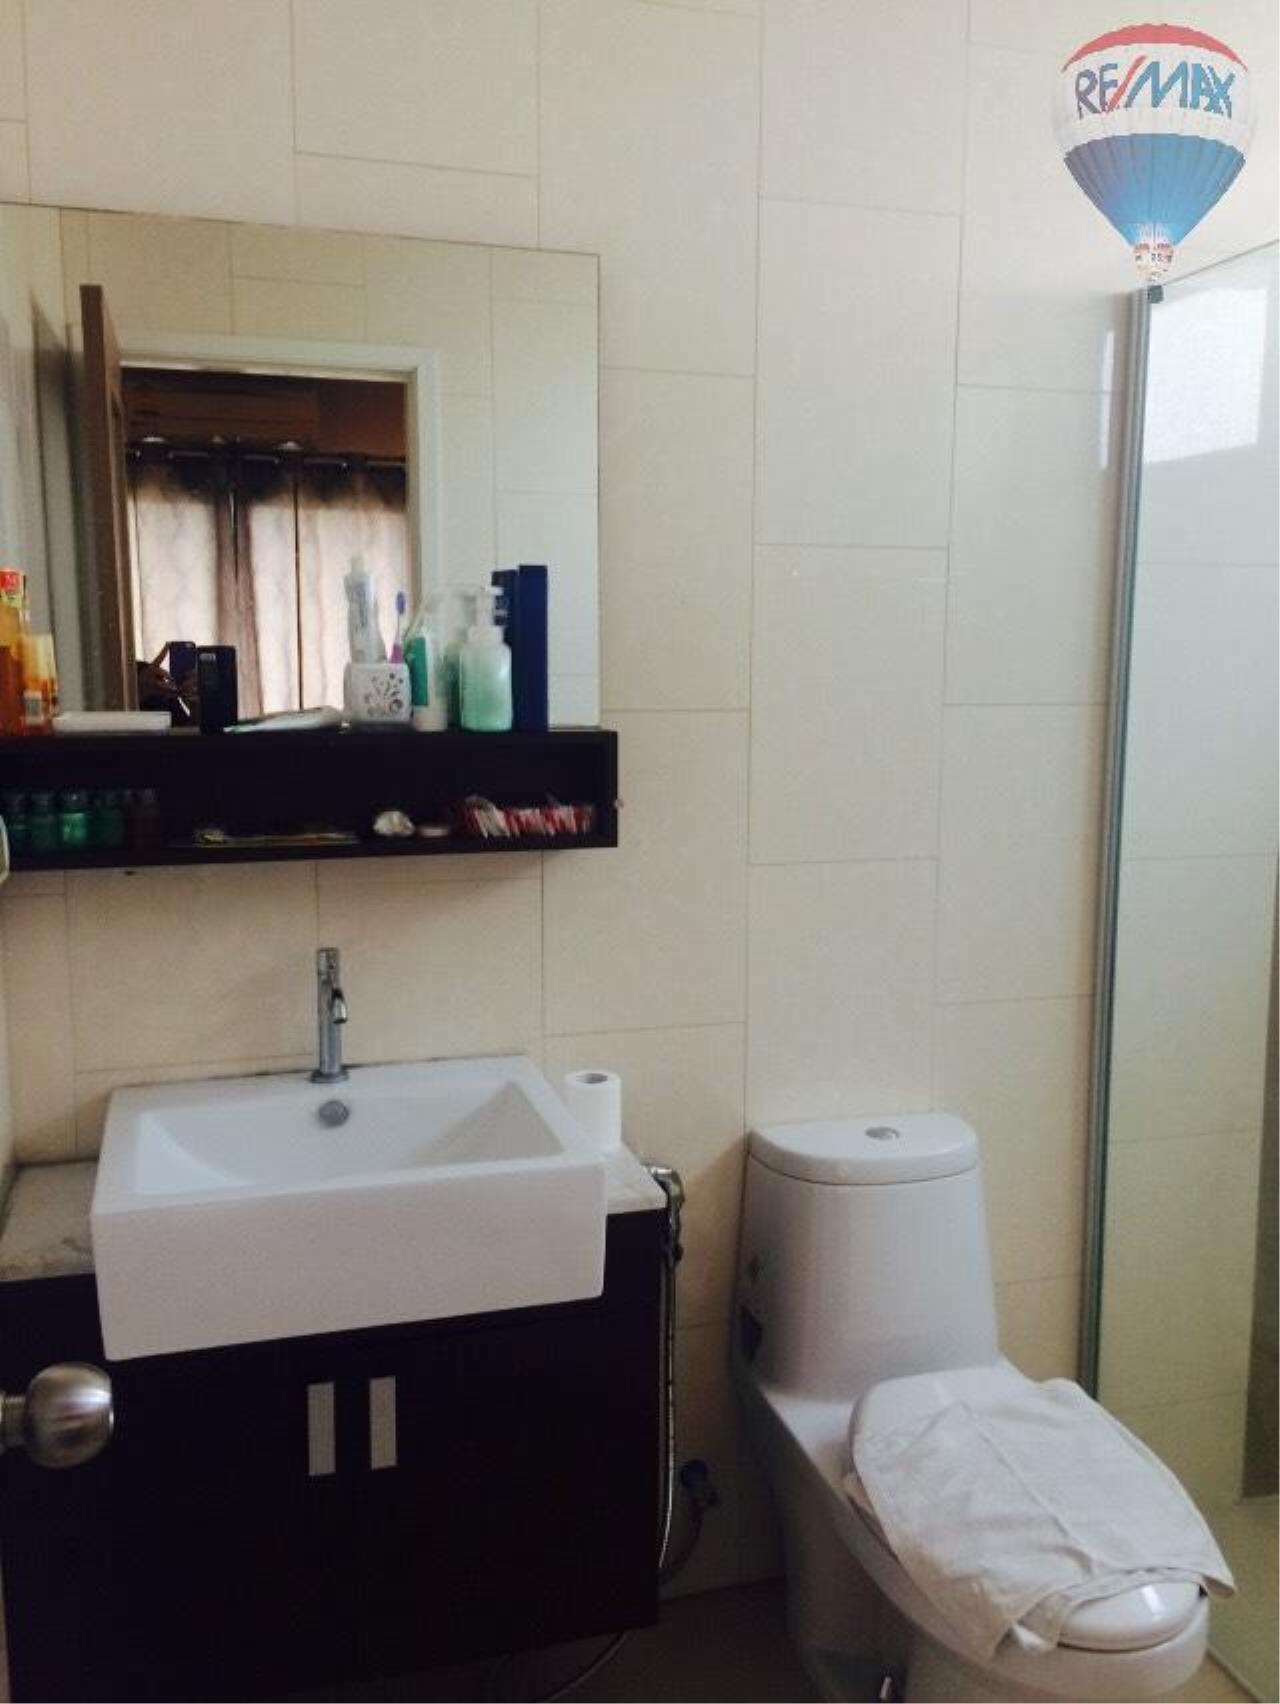 RE/MAX Properties Agency's Condominium for rent 2 bedrooms 92 Sq.m. at Renova Residence 13